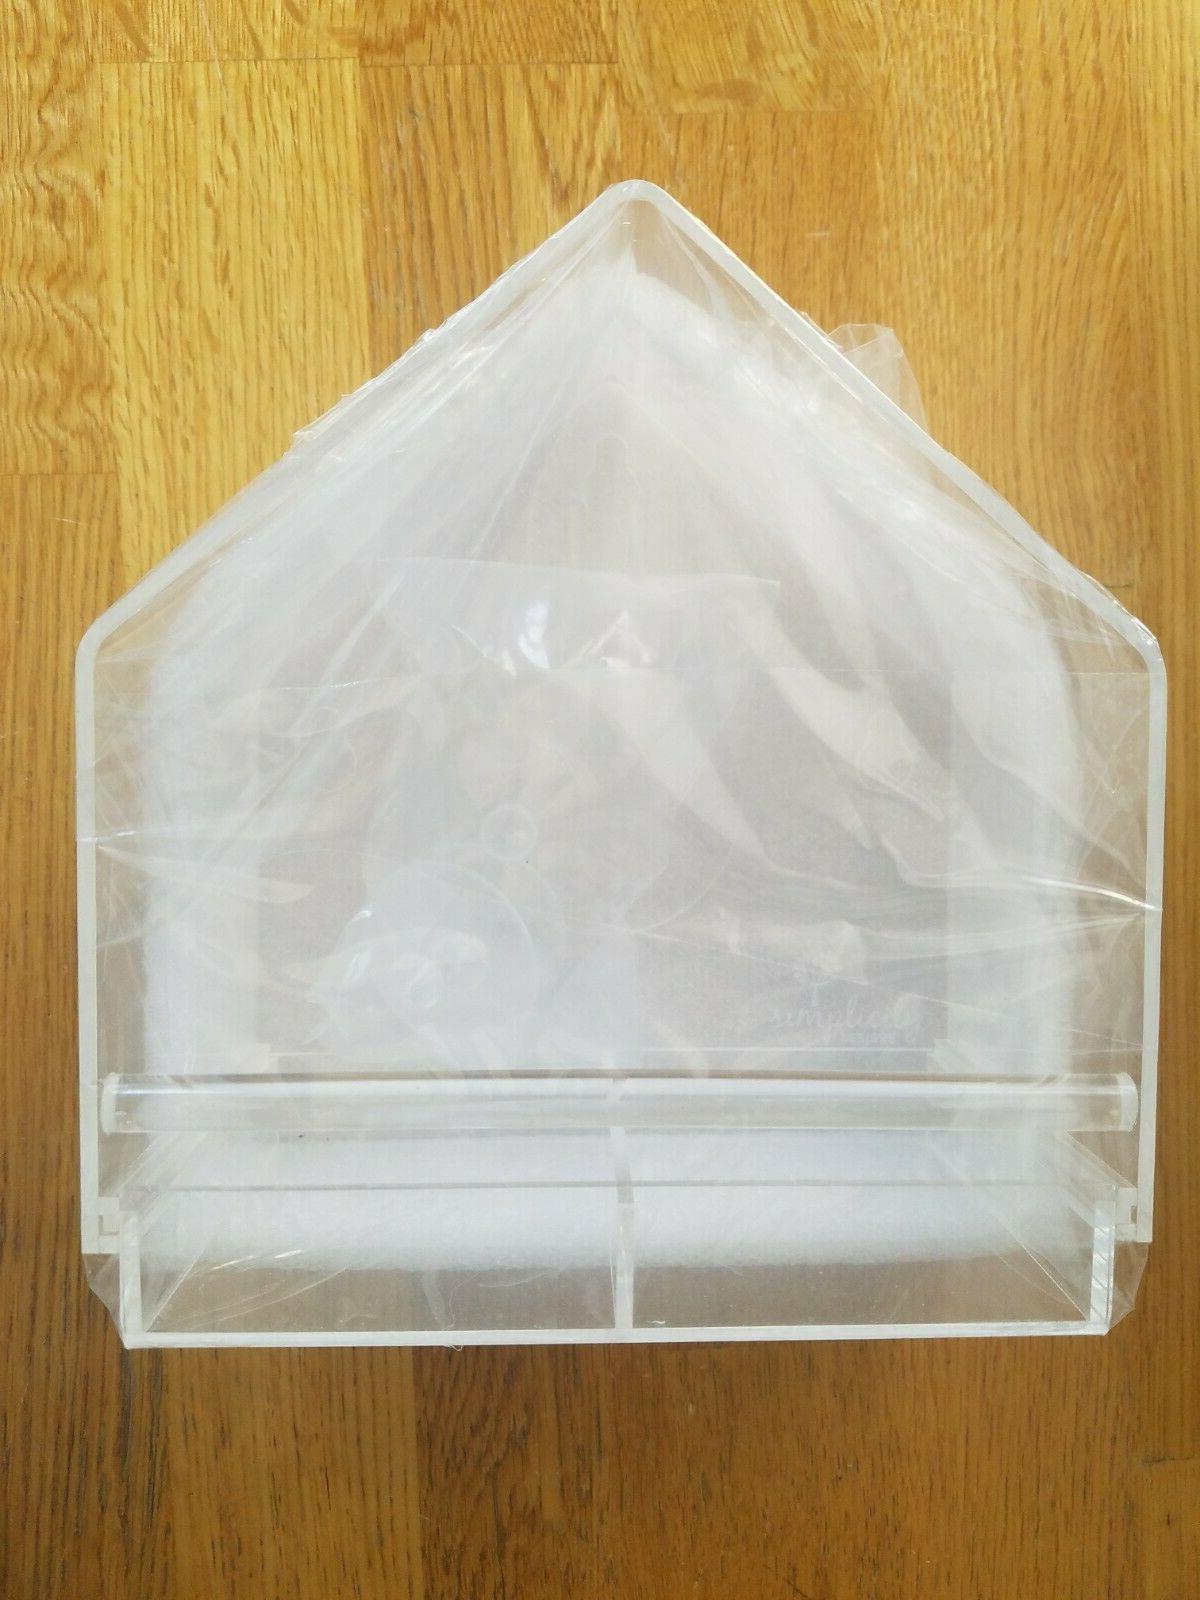 Acrylic Window Bird Feeder with Tray Durable Window Viewing Birdfeeder